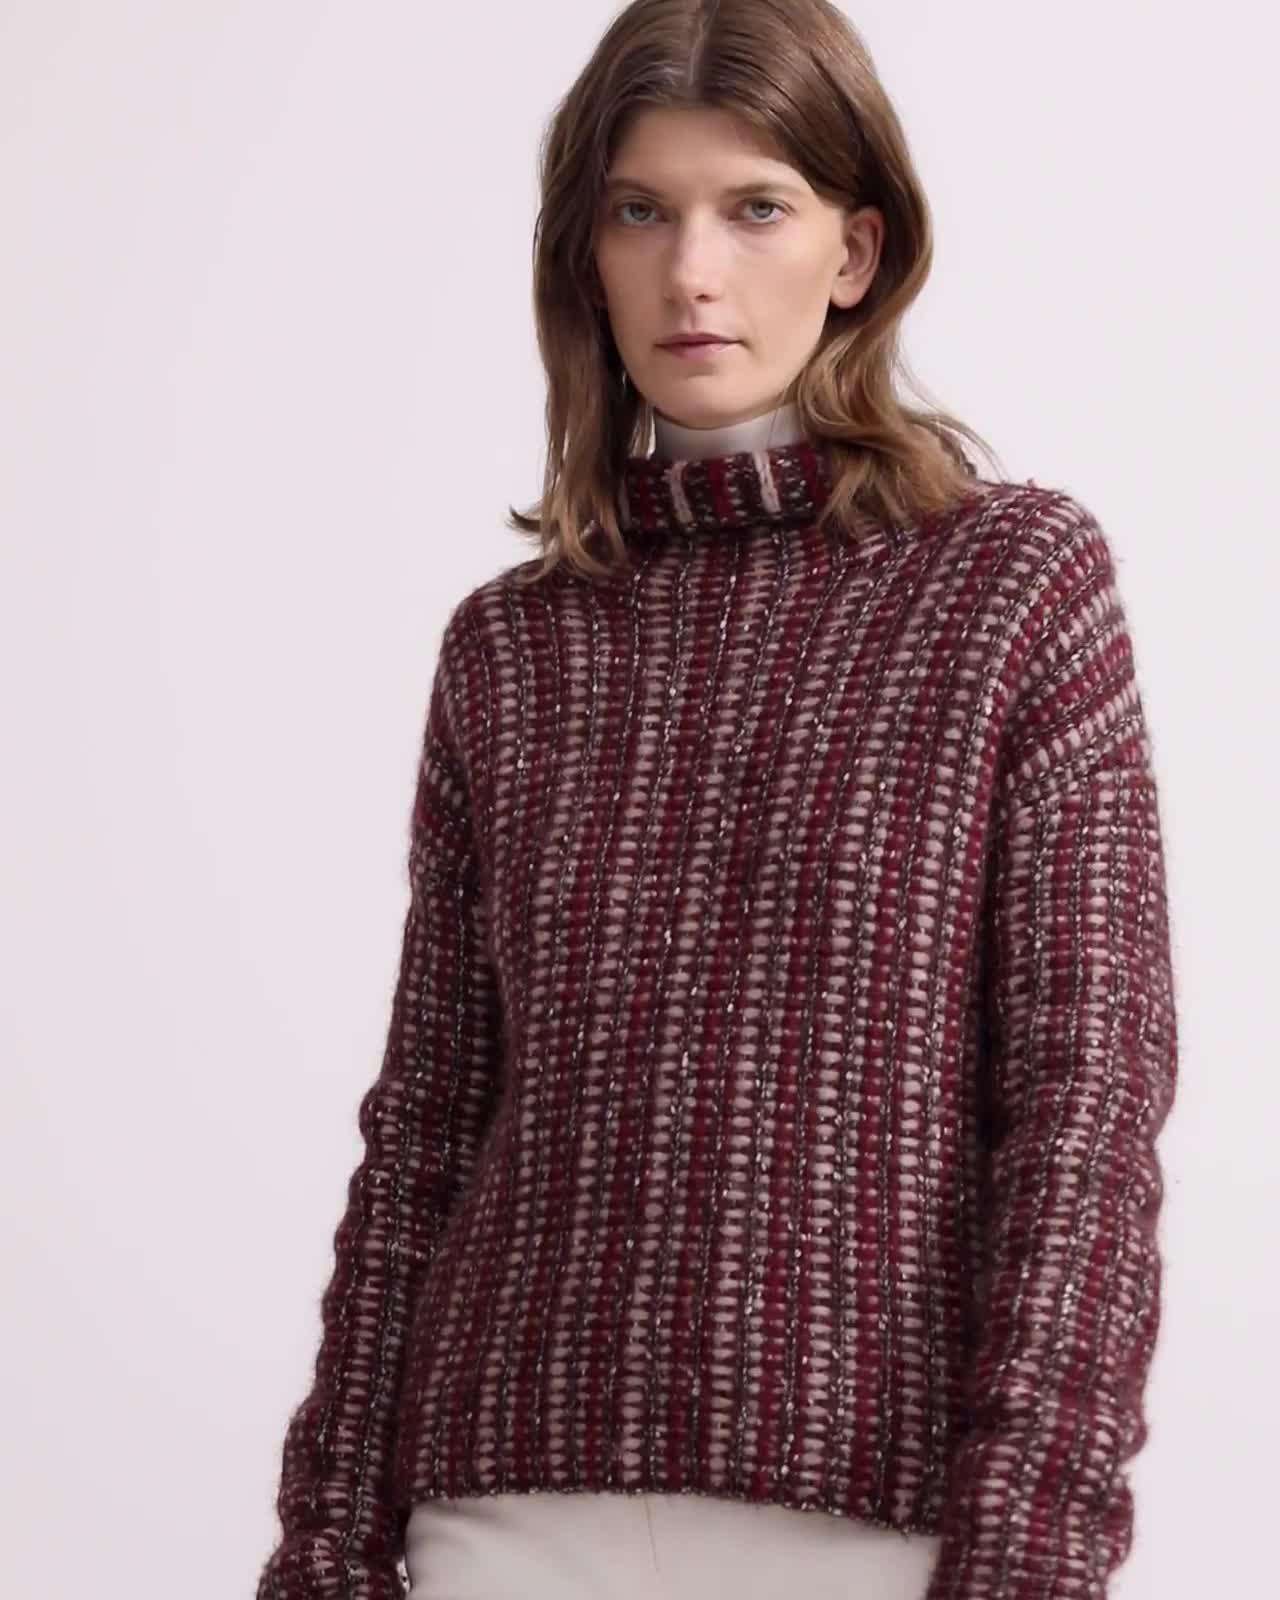 Turtleneck Sweater in Inlay Wool